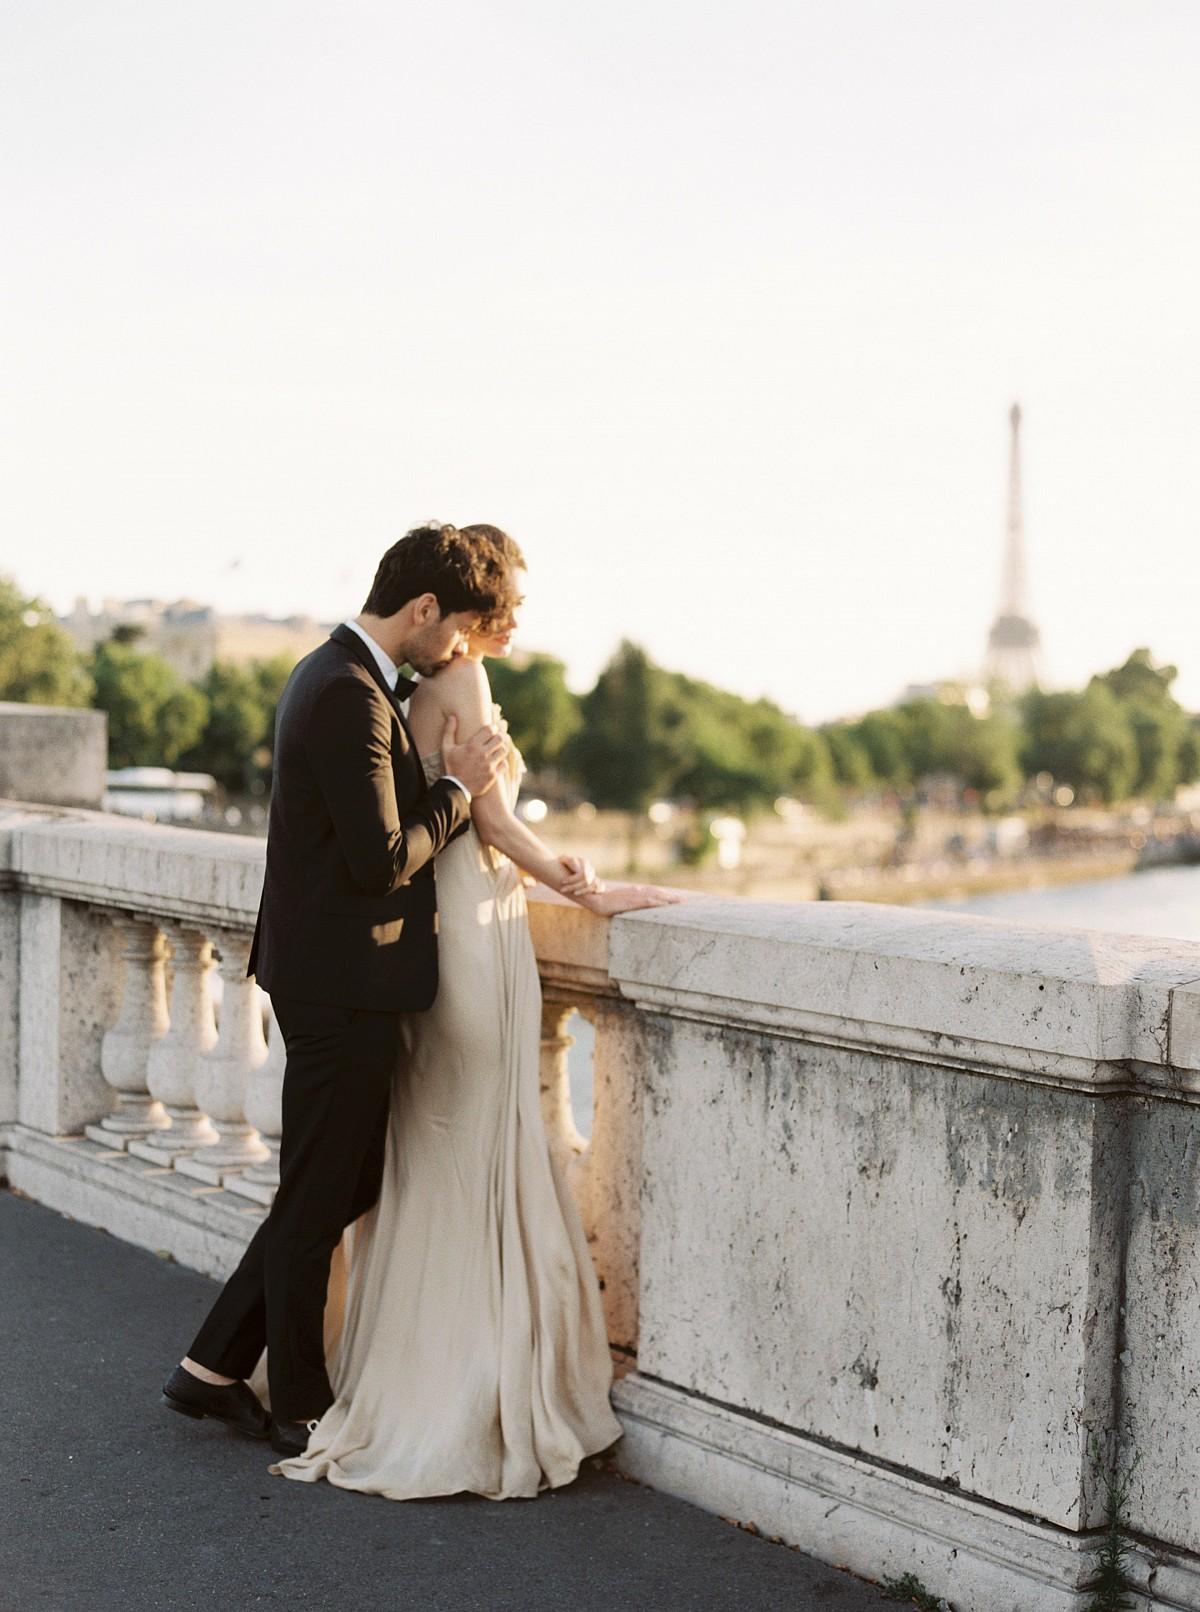 A Simple, yet Stunning Parisian Elopement